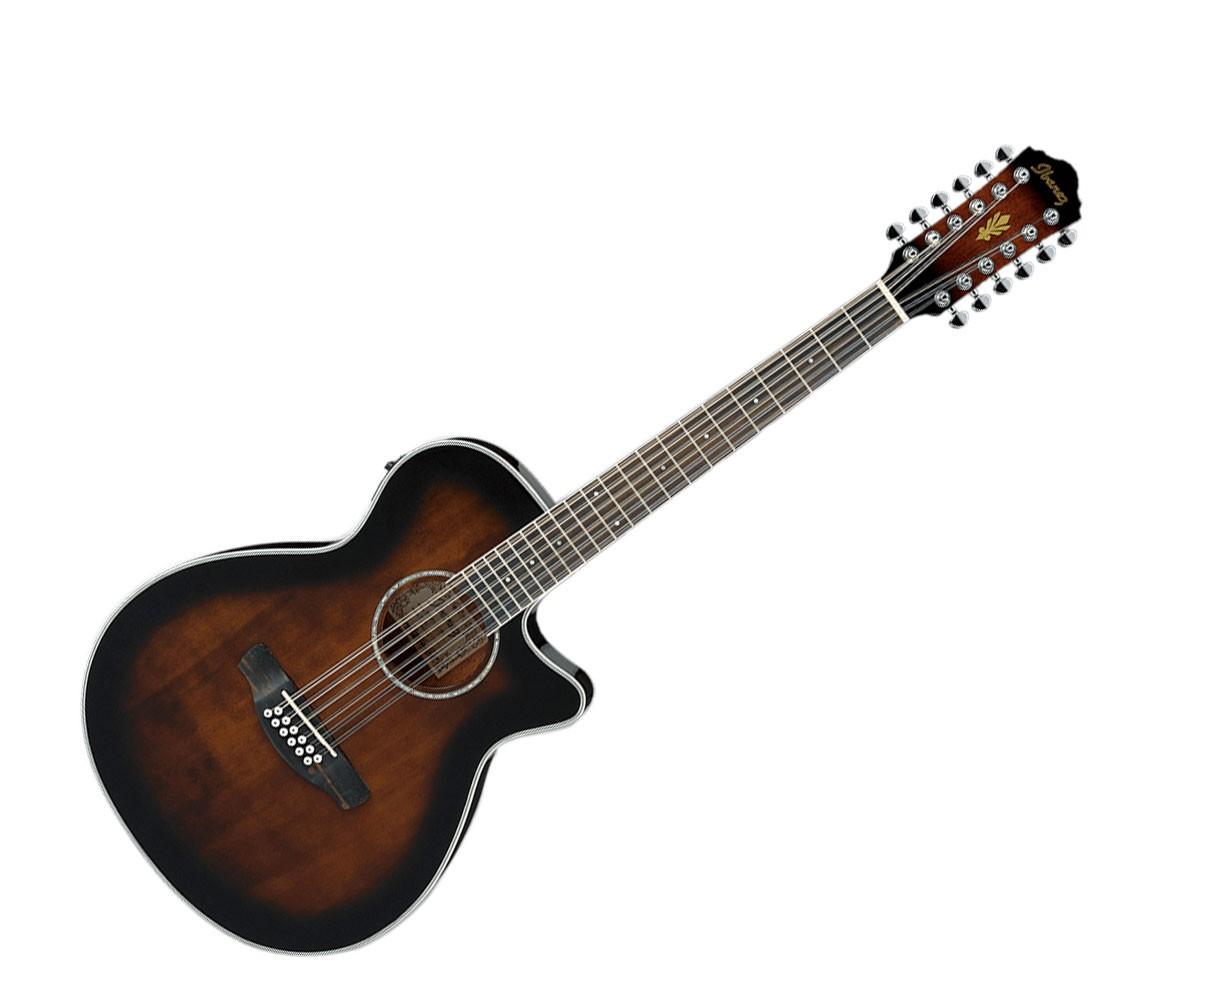 Ibanez AEG1812II DVS 12 String Acoustic Electric Guitar Dark Violin Sunburst